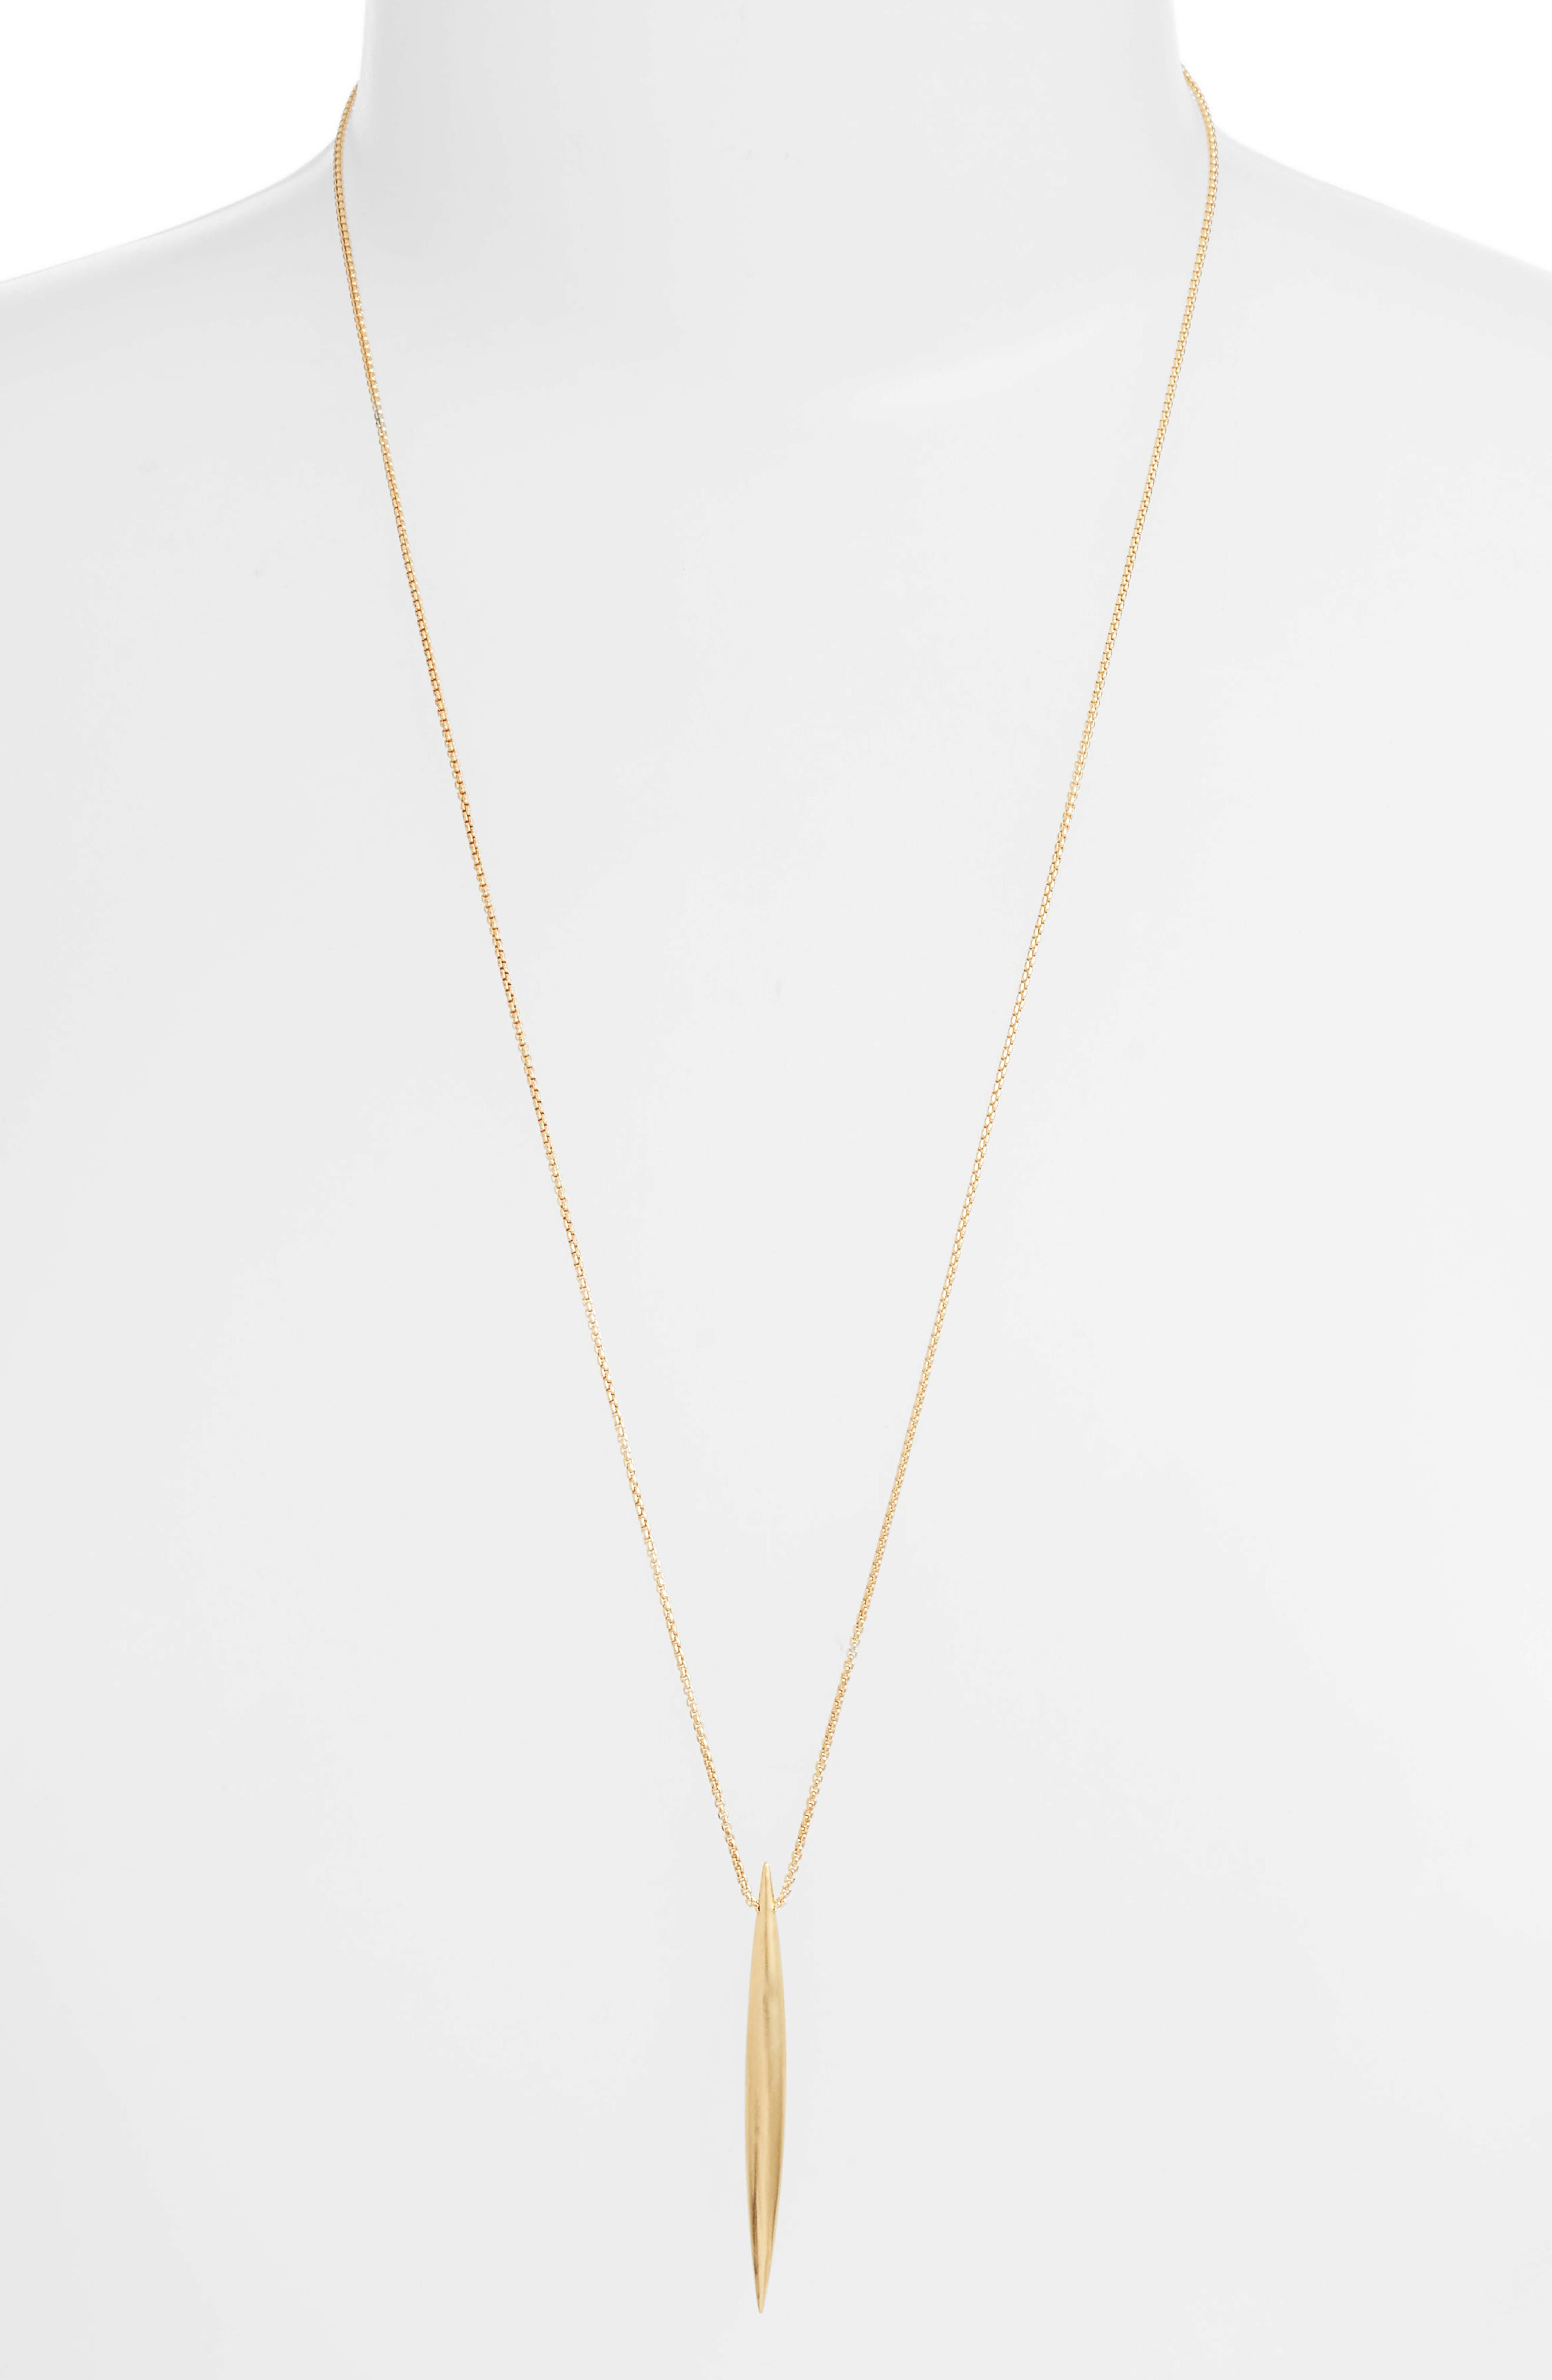 Taj Pendant Adjustable Necklace,                             Main thumbnail 1, color,                             GOLD